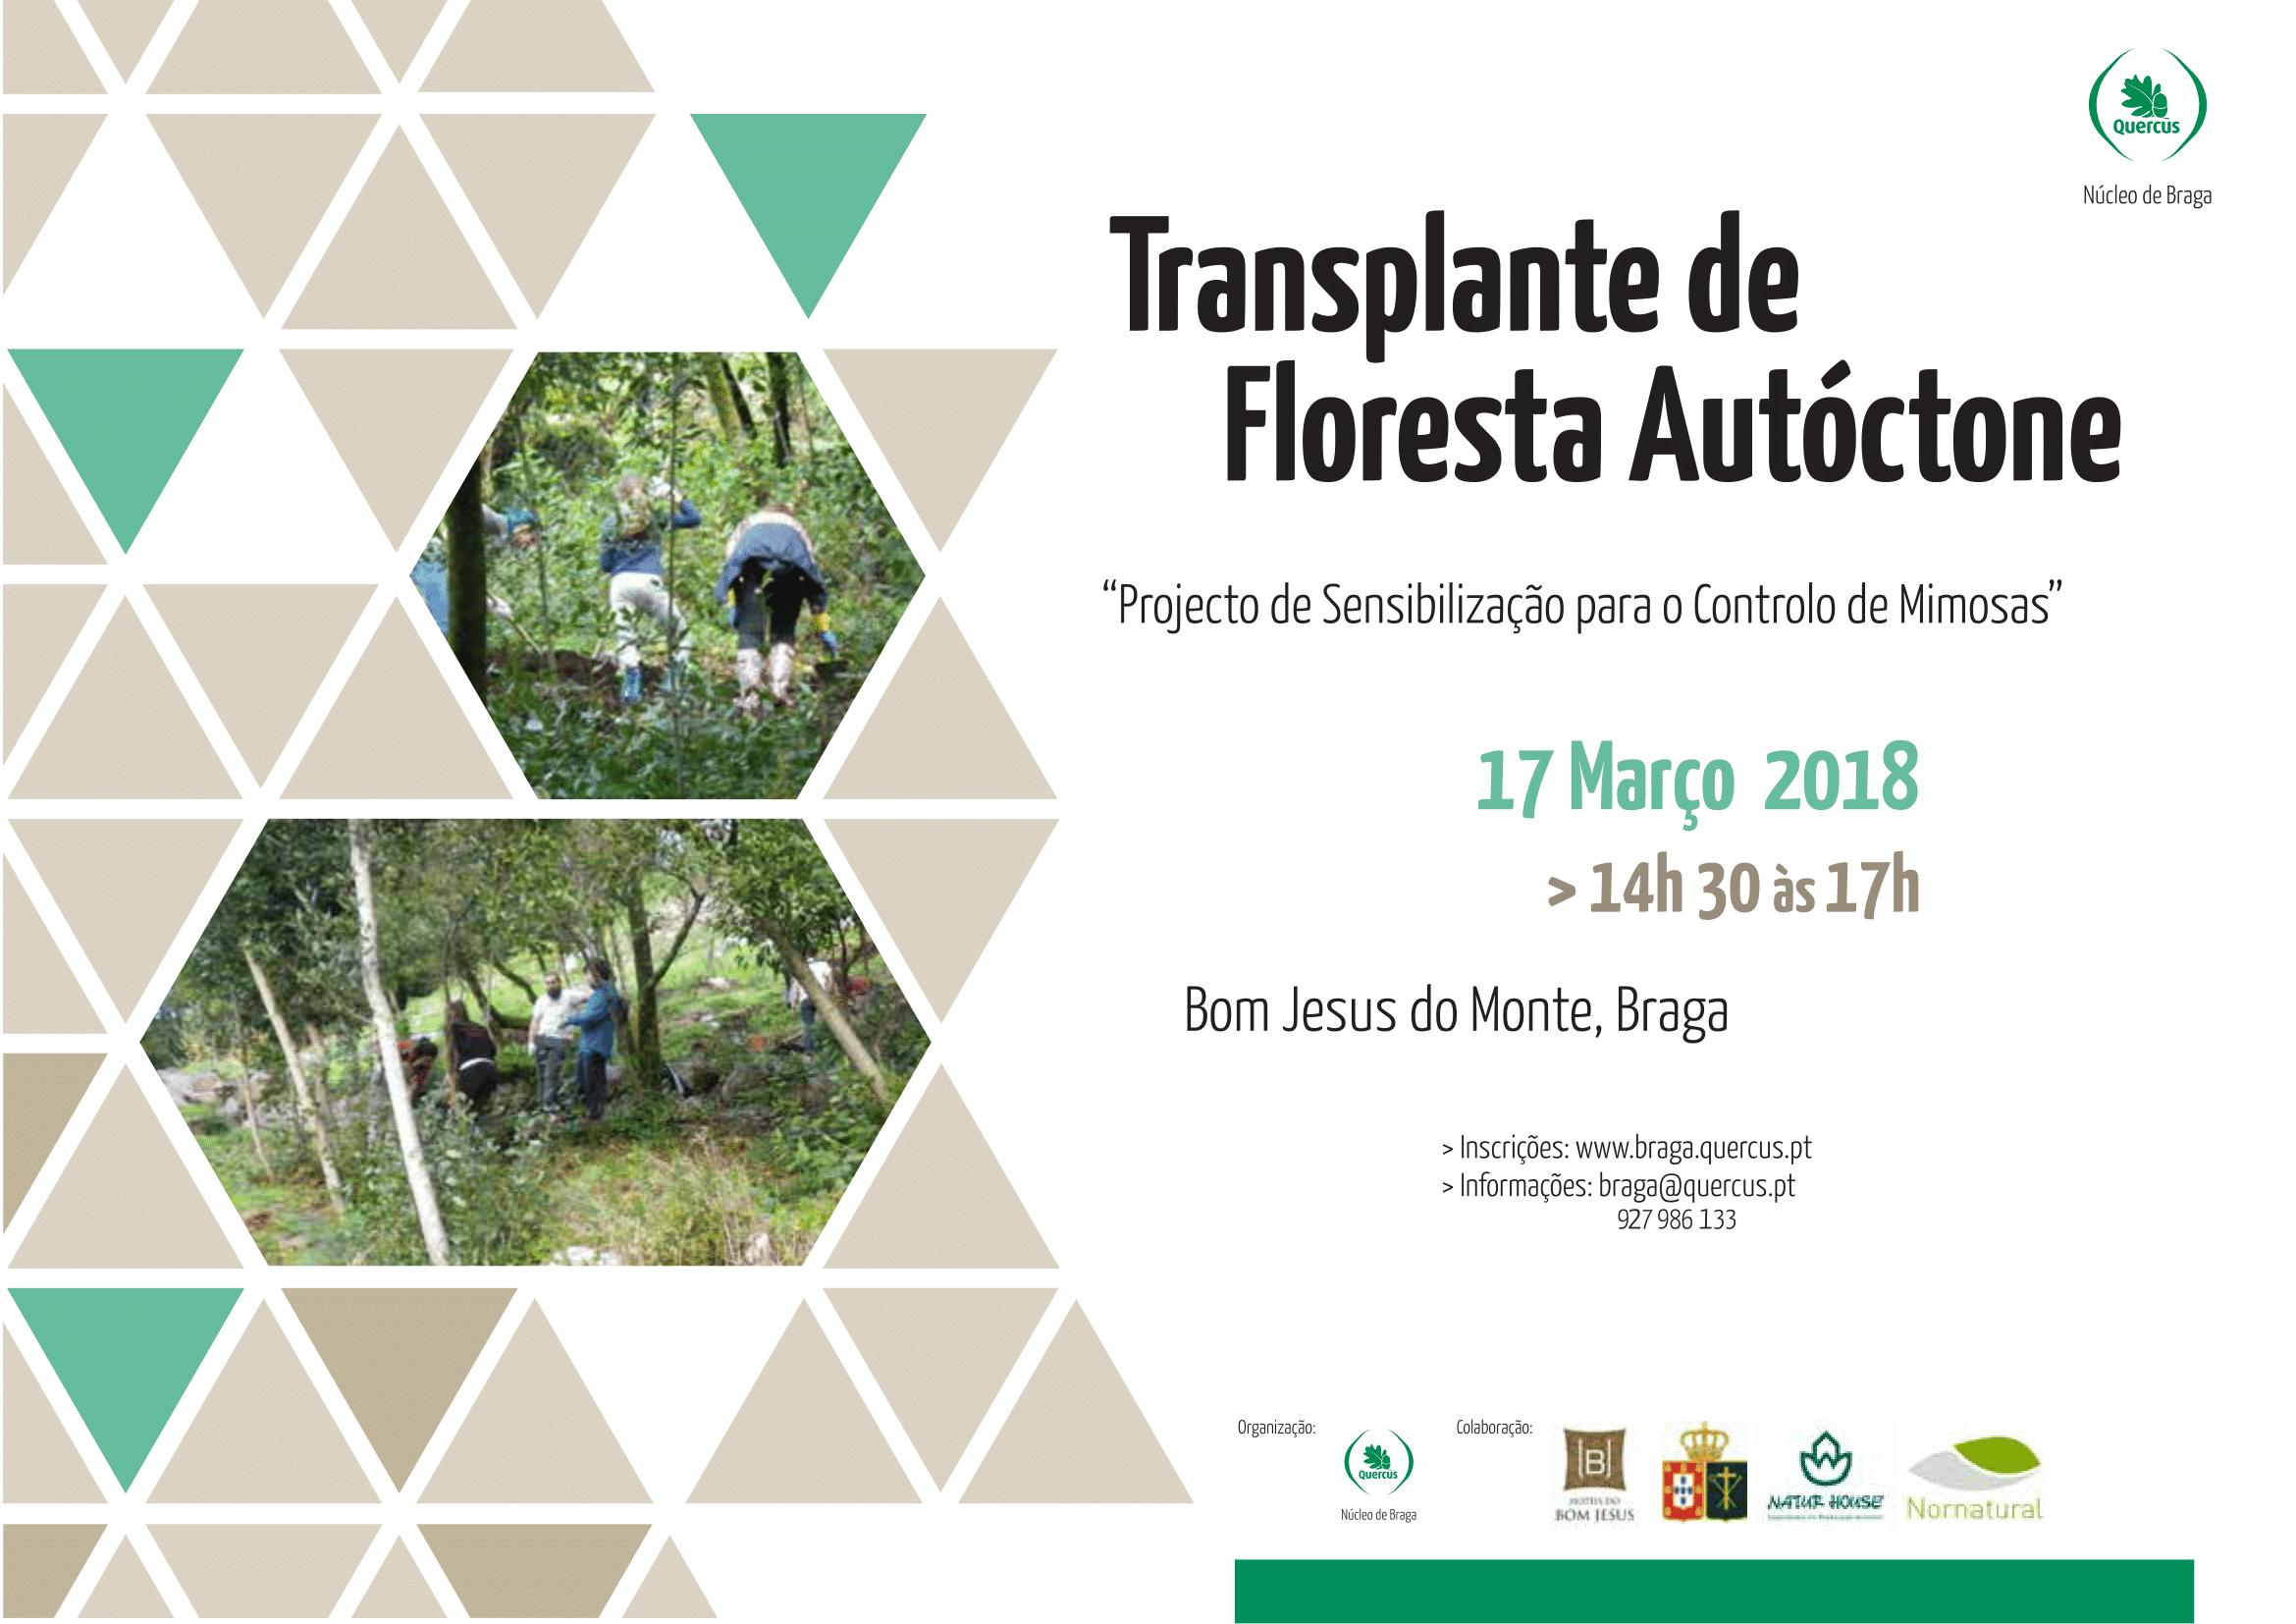 Cartaz Transplante da floresta autoctone março 2018 1